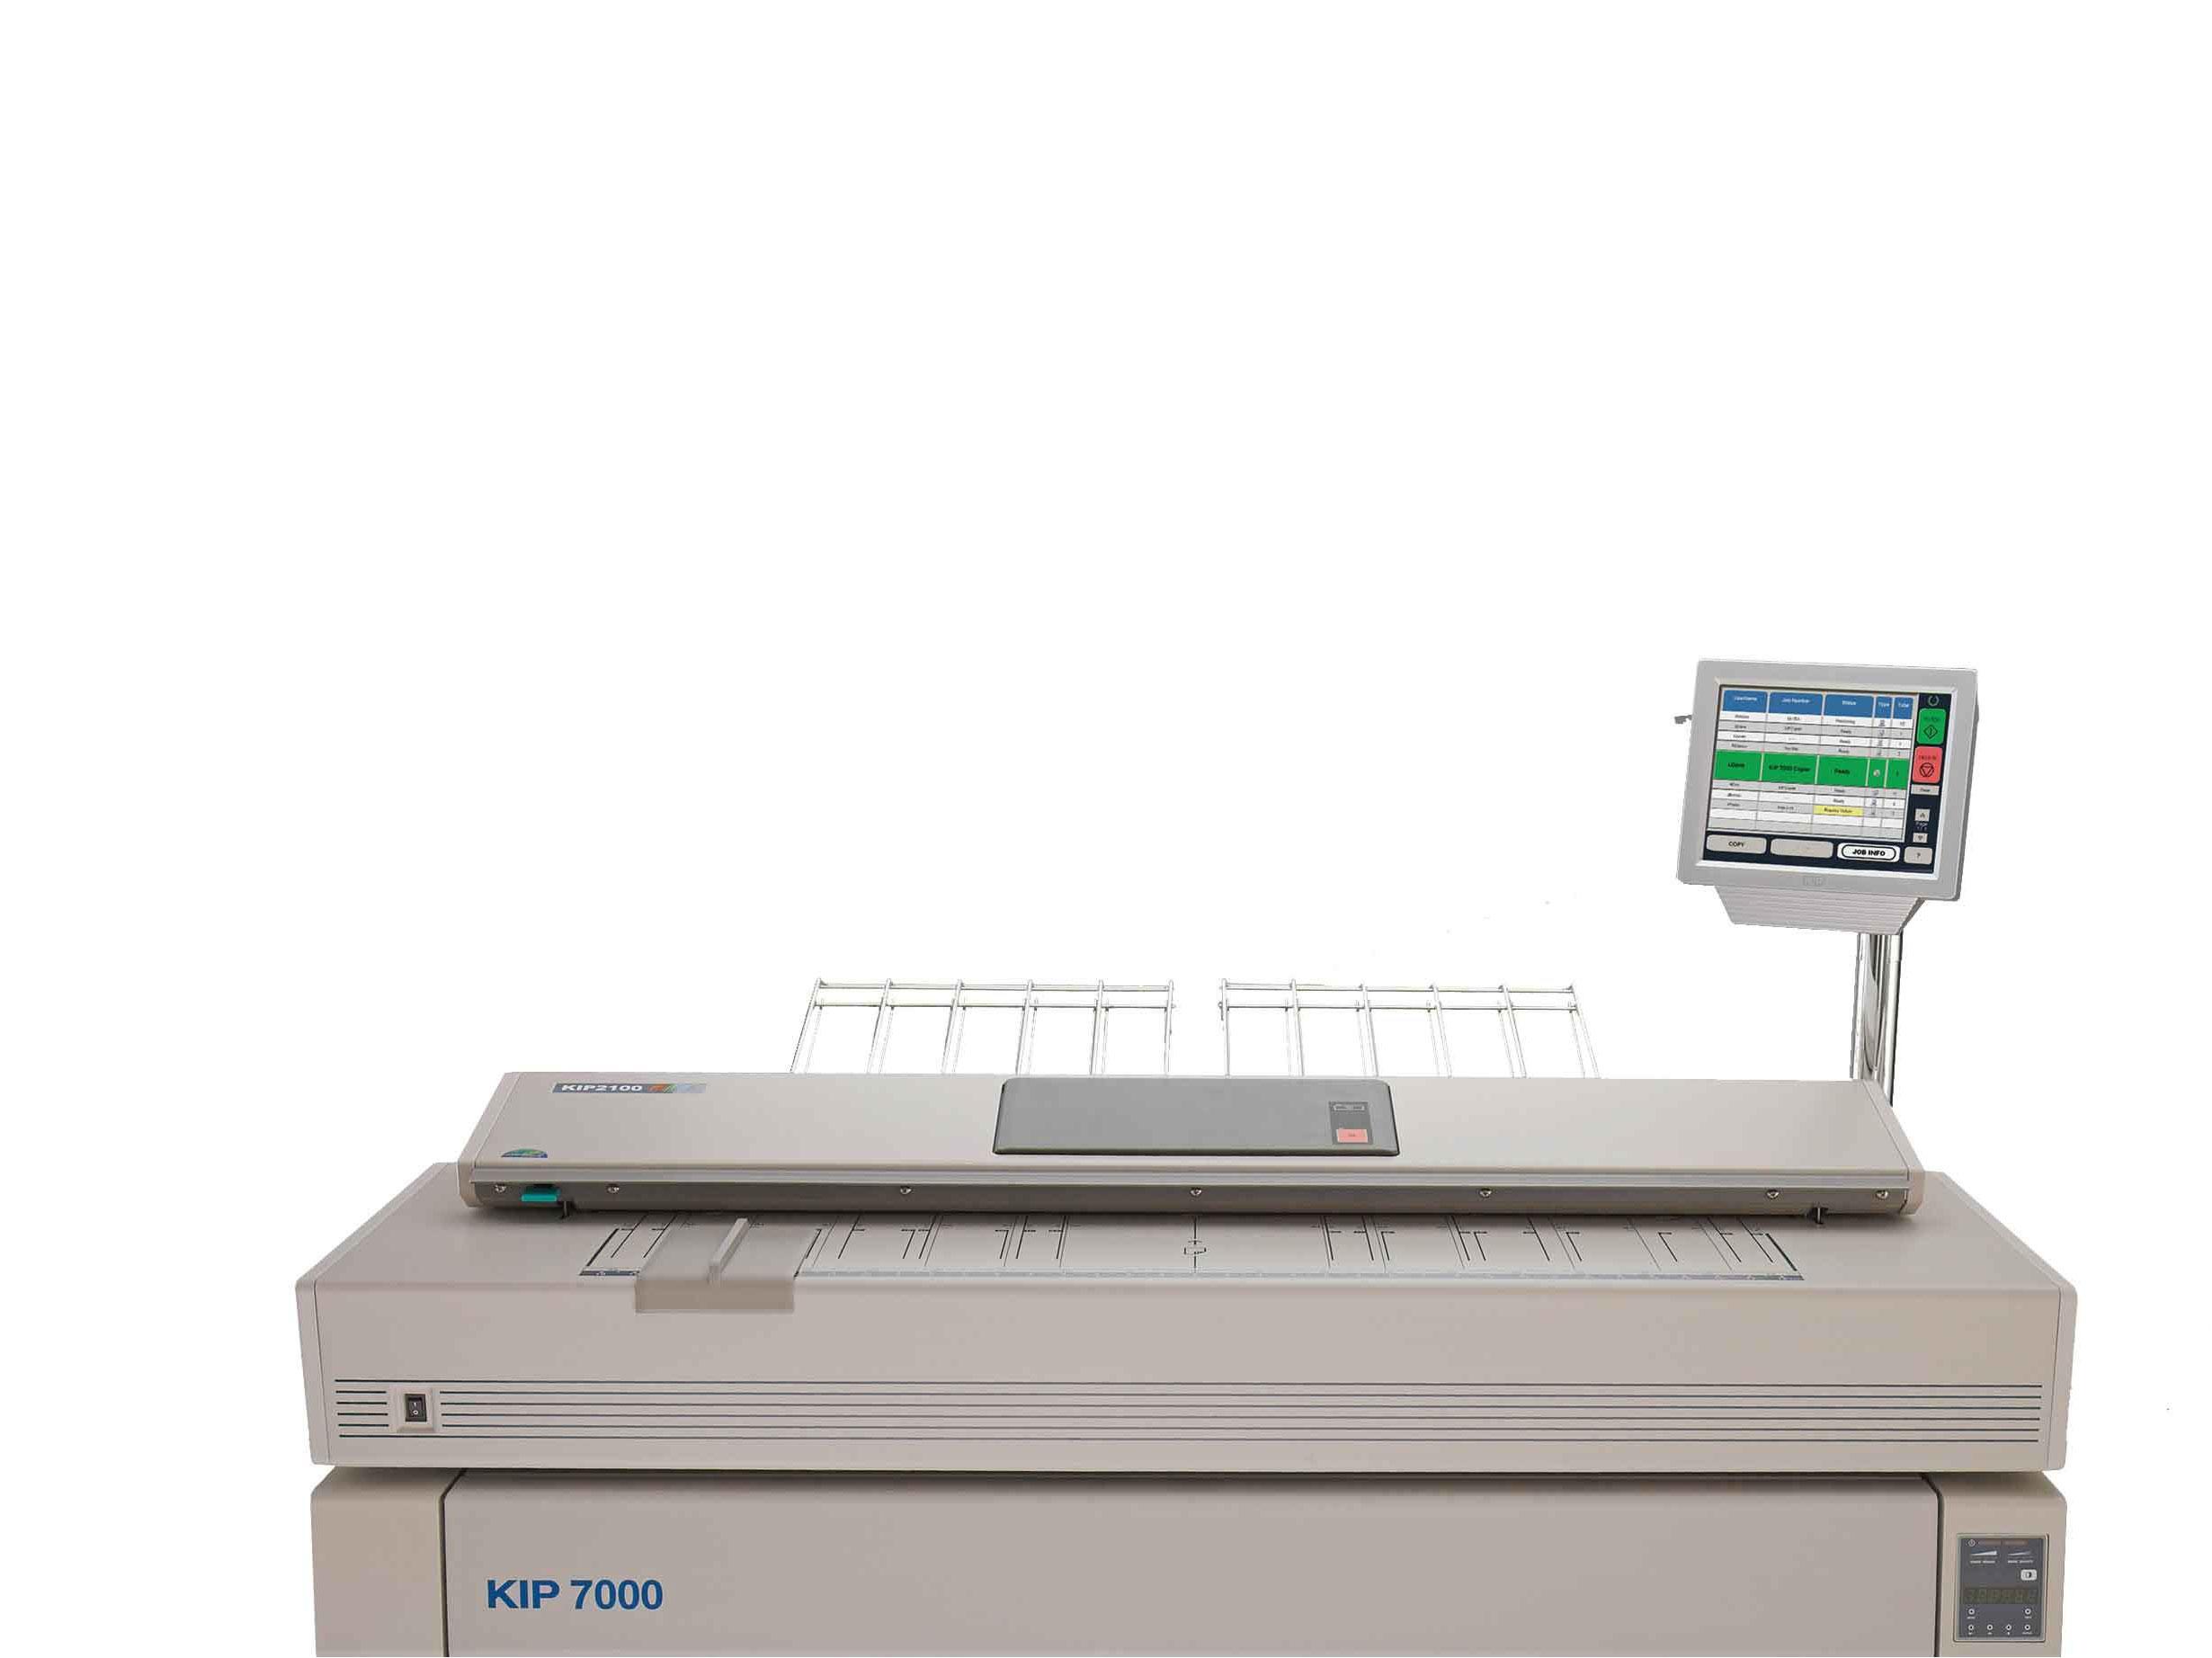 Fotocopiadora Kip 7100 Barata